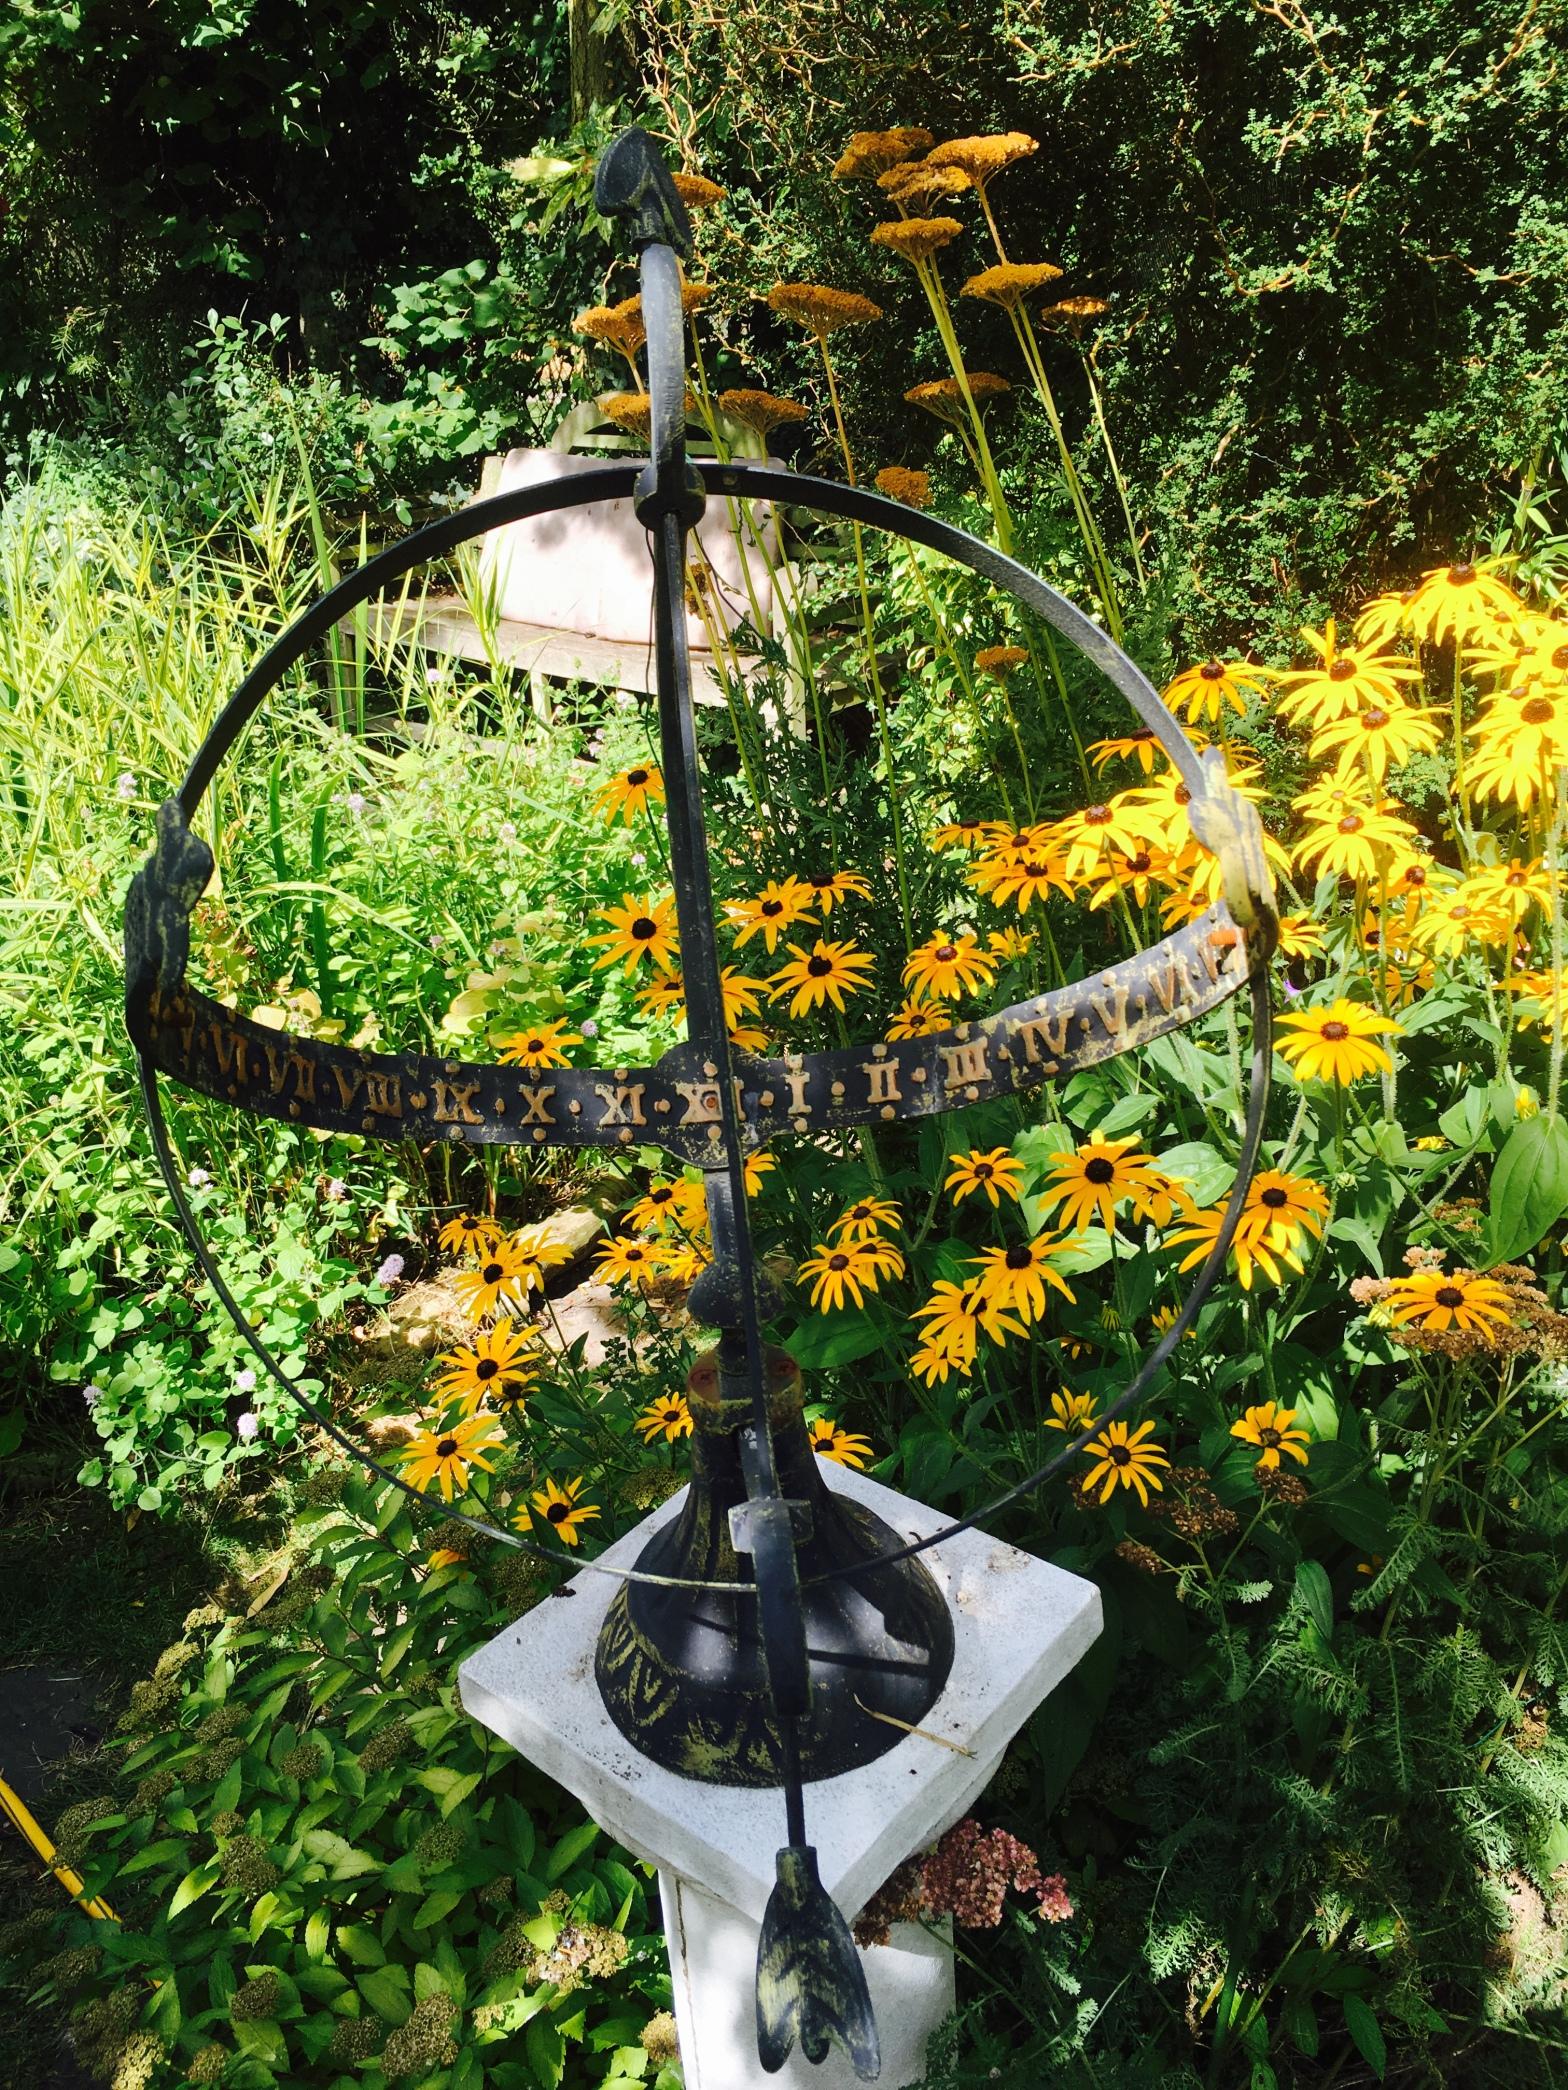 Daisy garden peaceful tranquility